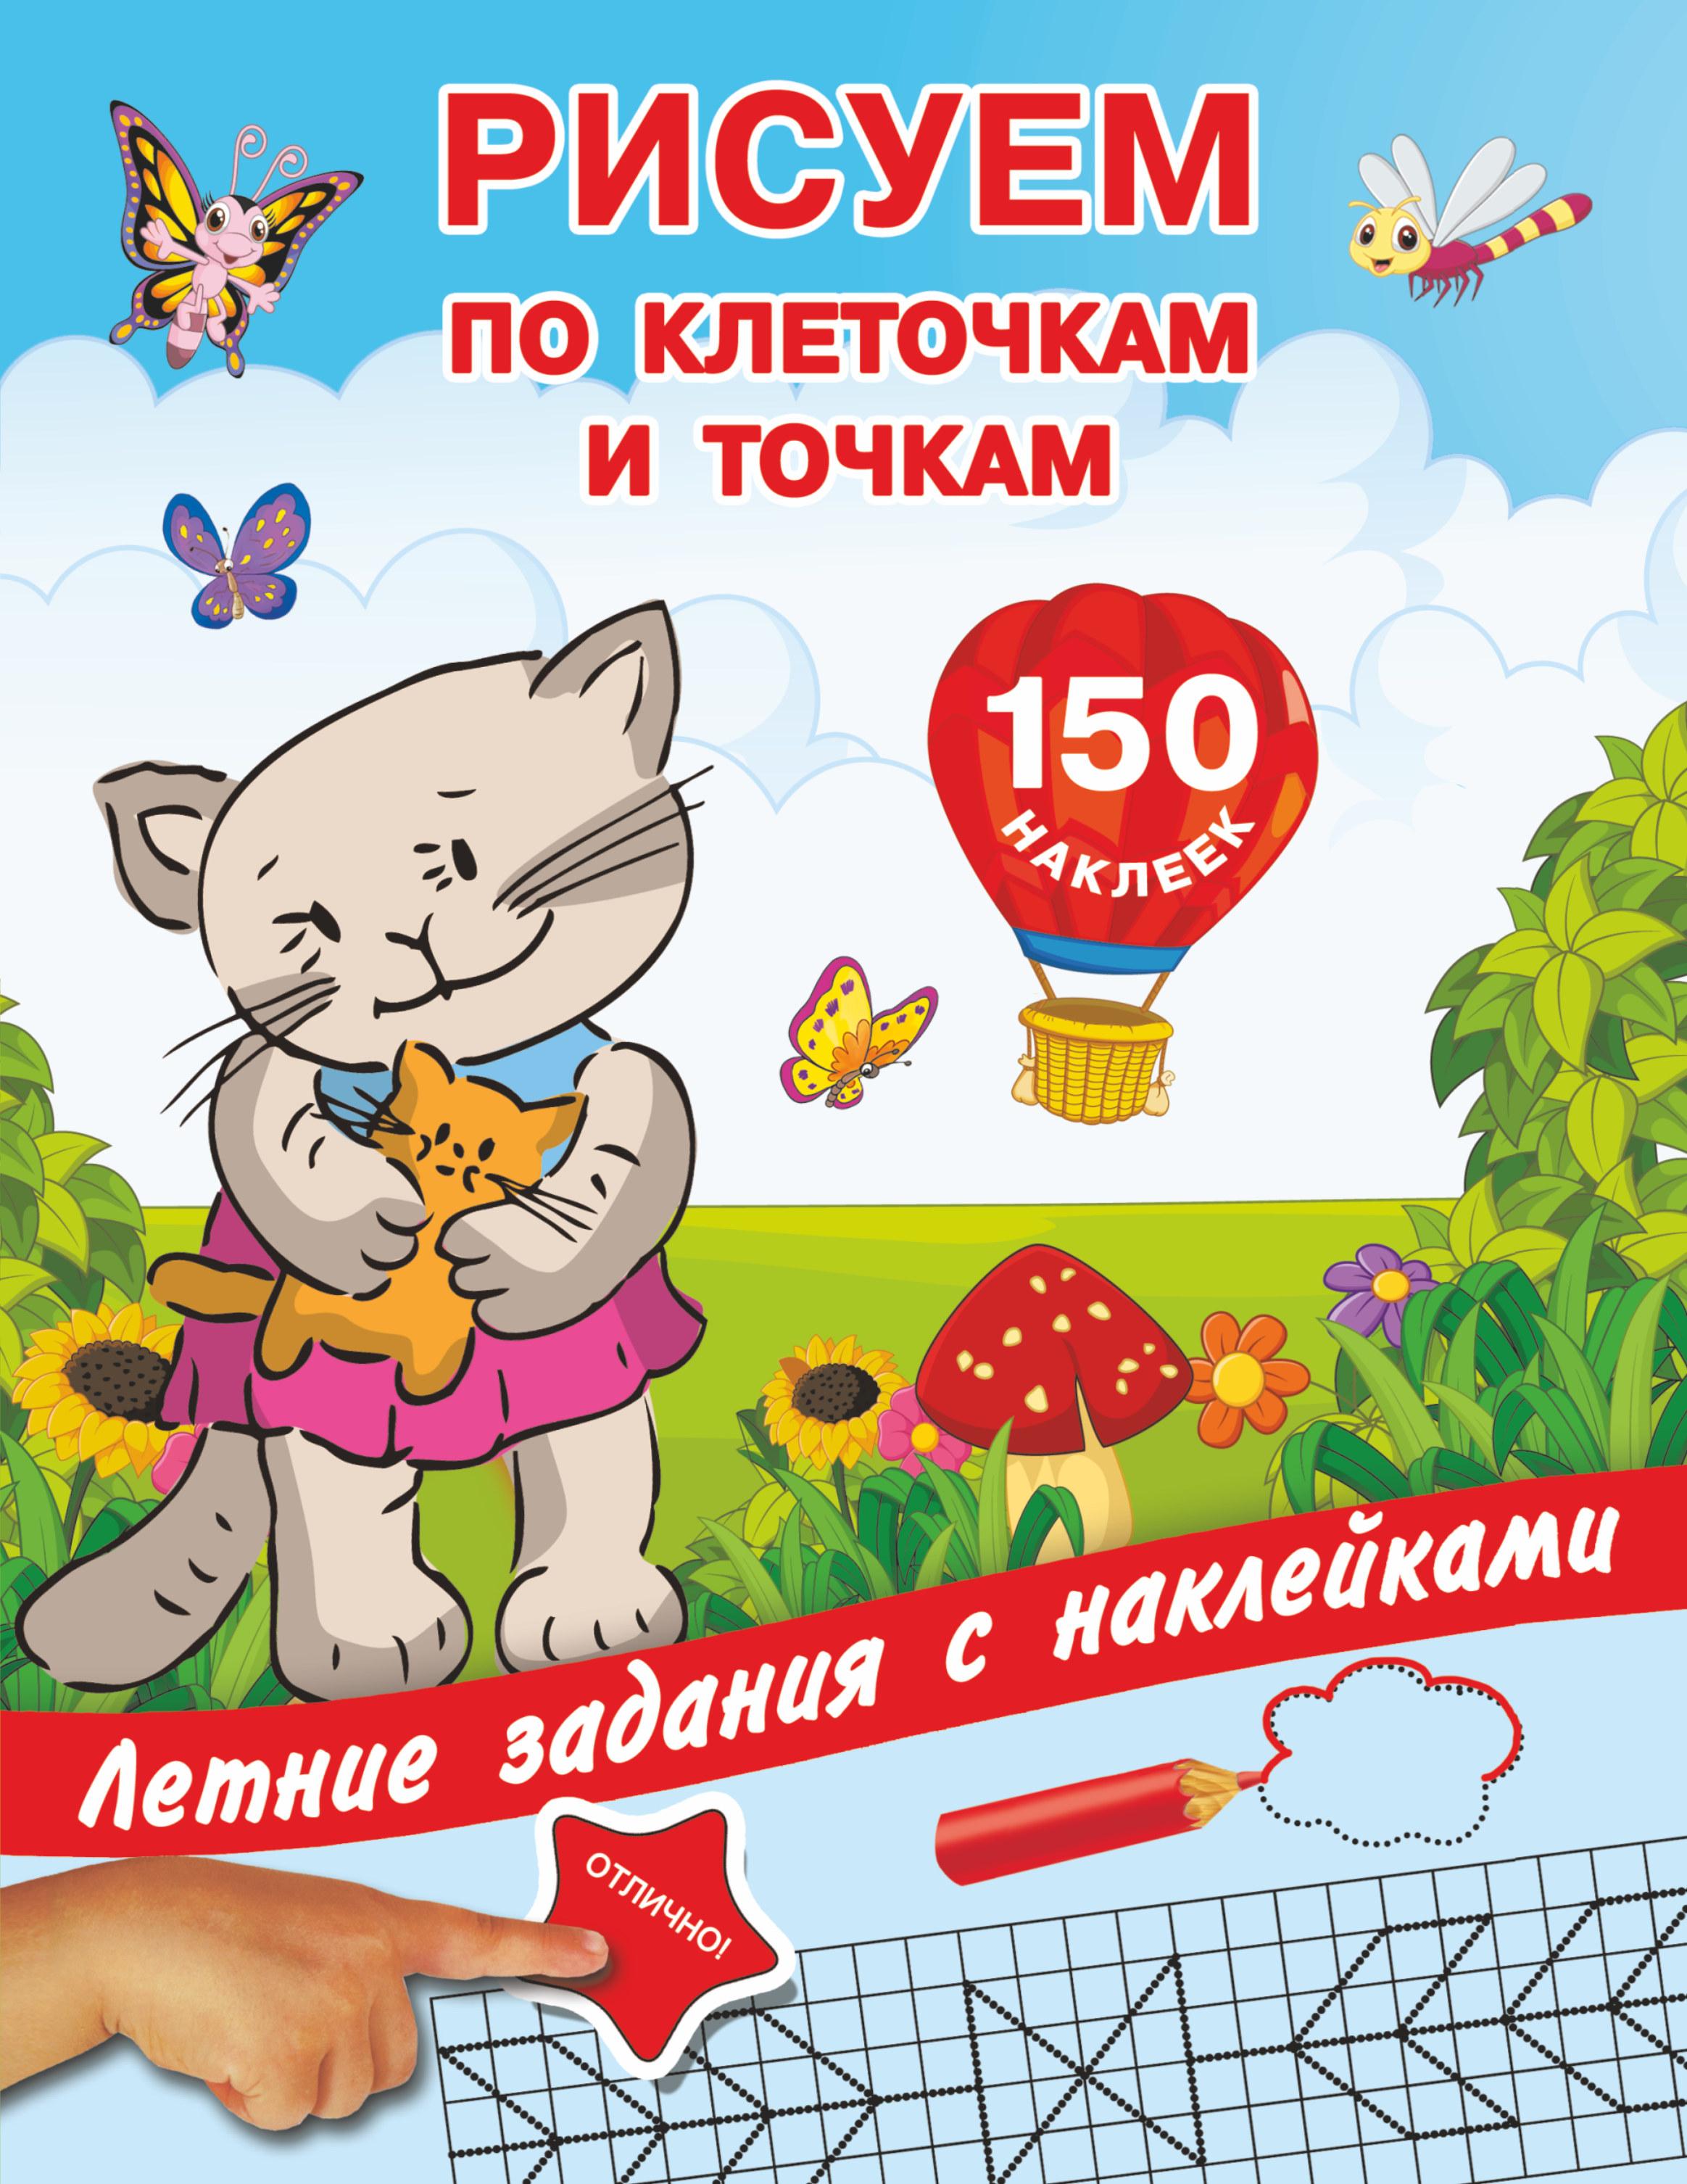 Дмитриева В.Г., Двинина Л.В. Рисуем по клеточкам и точкам с наклейками